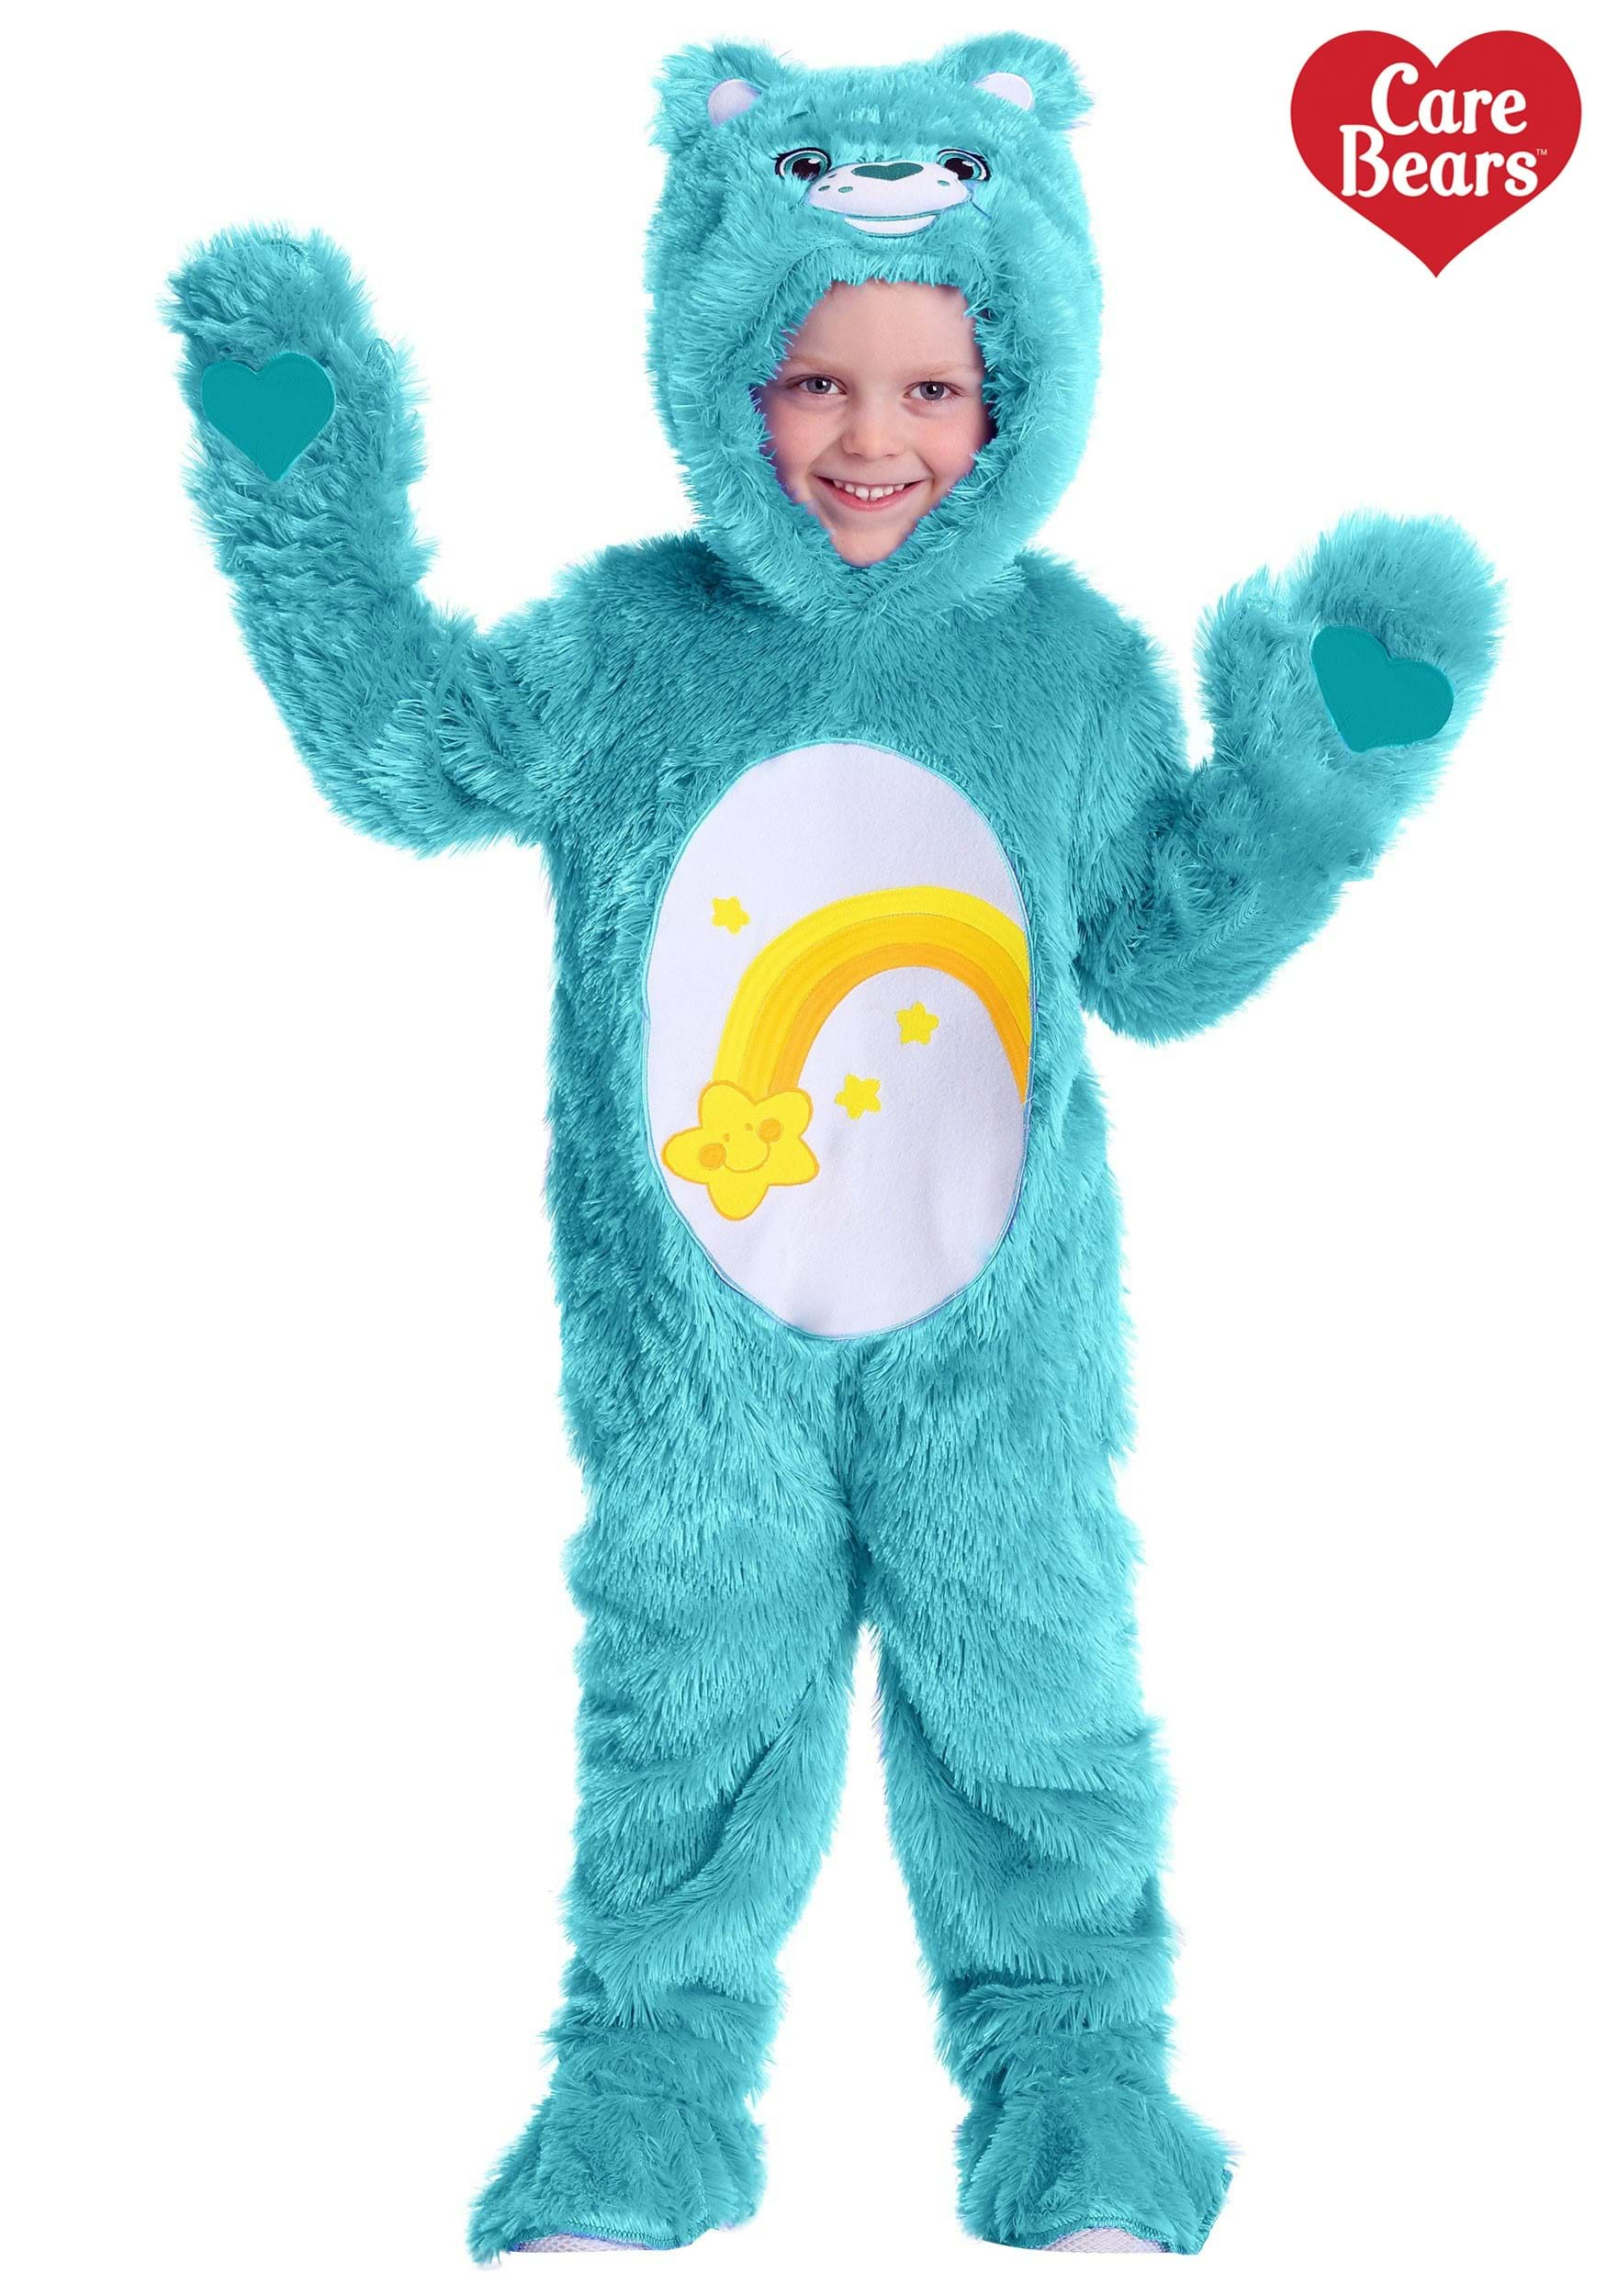 Care Bears Toddler Wish Bear Costume  sc 1 st  Halloween Costumes UK & Toddler Care Bears Wish Bear Costume